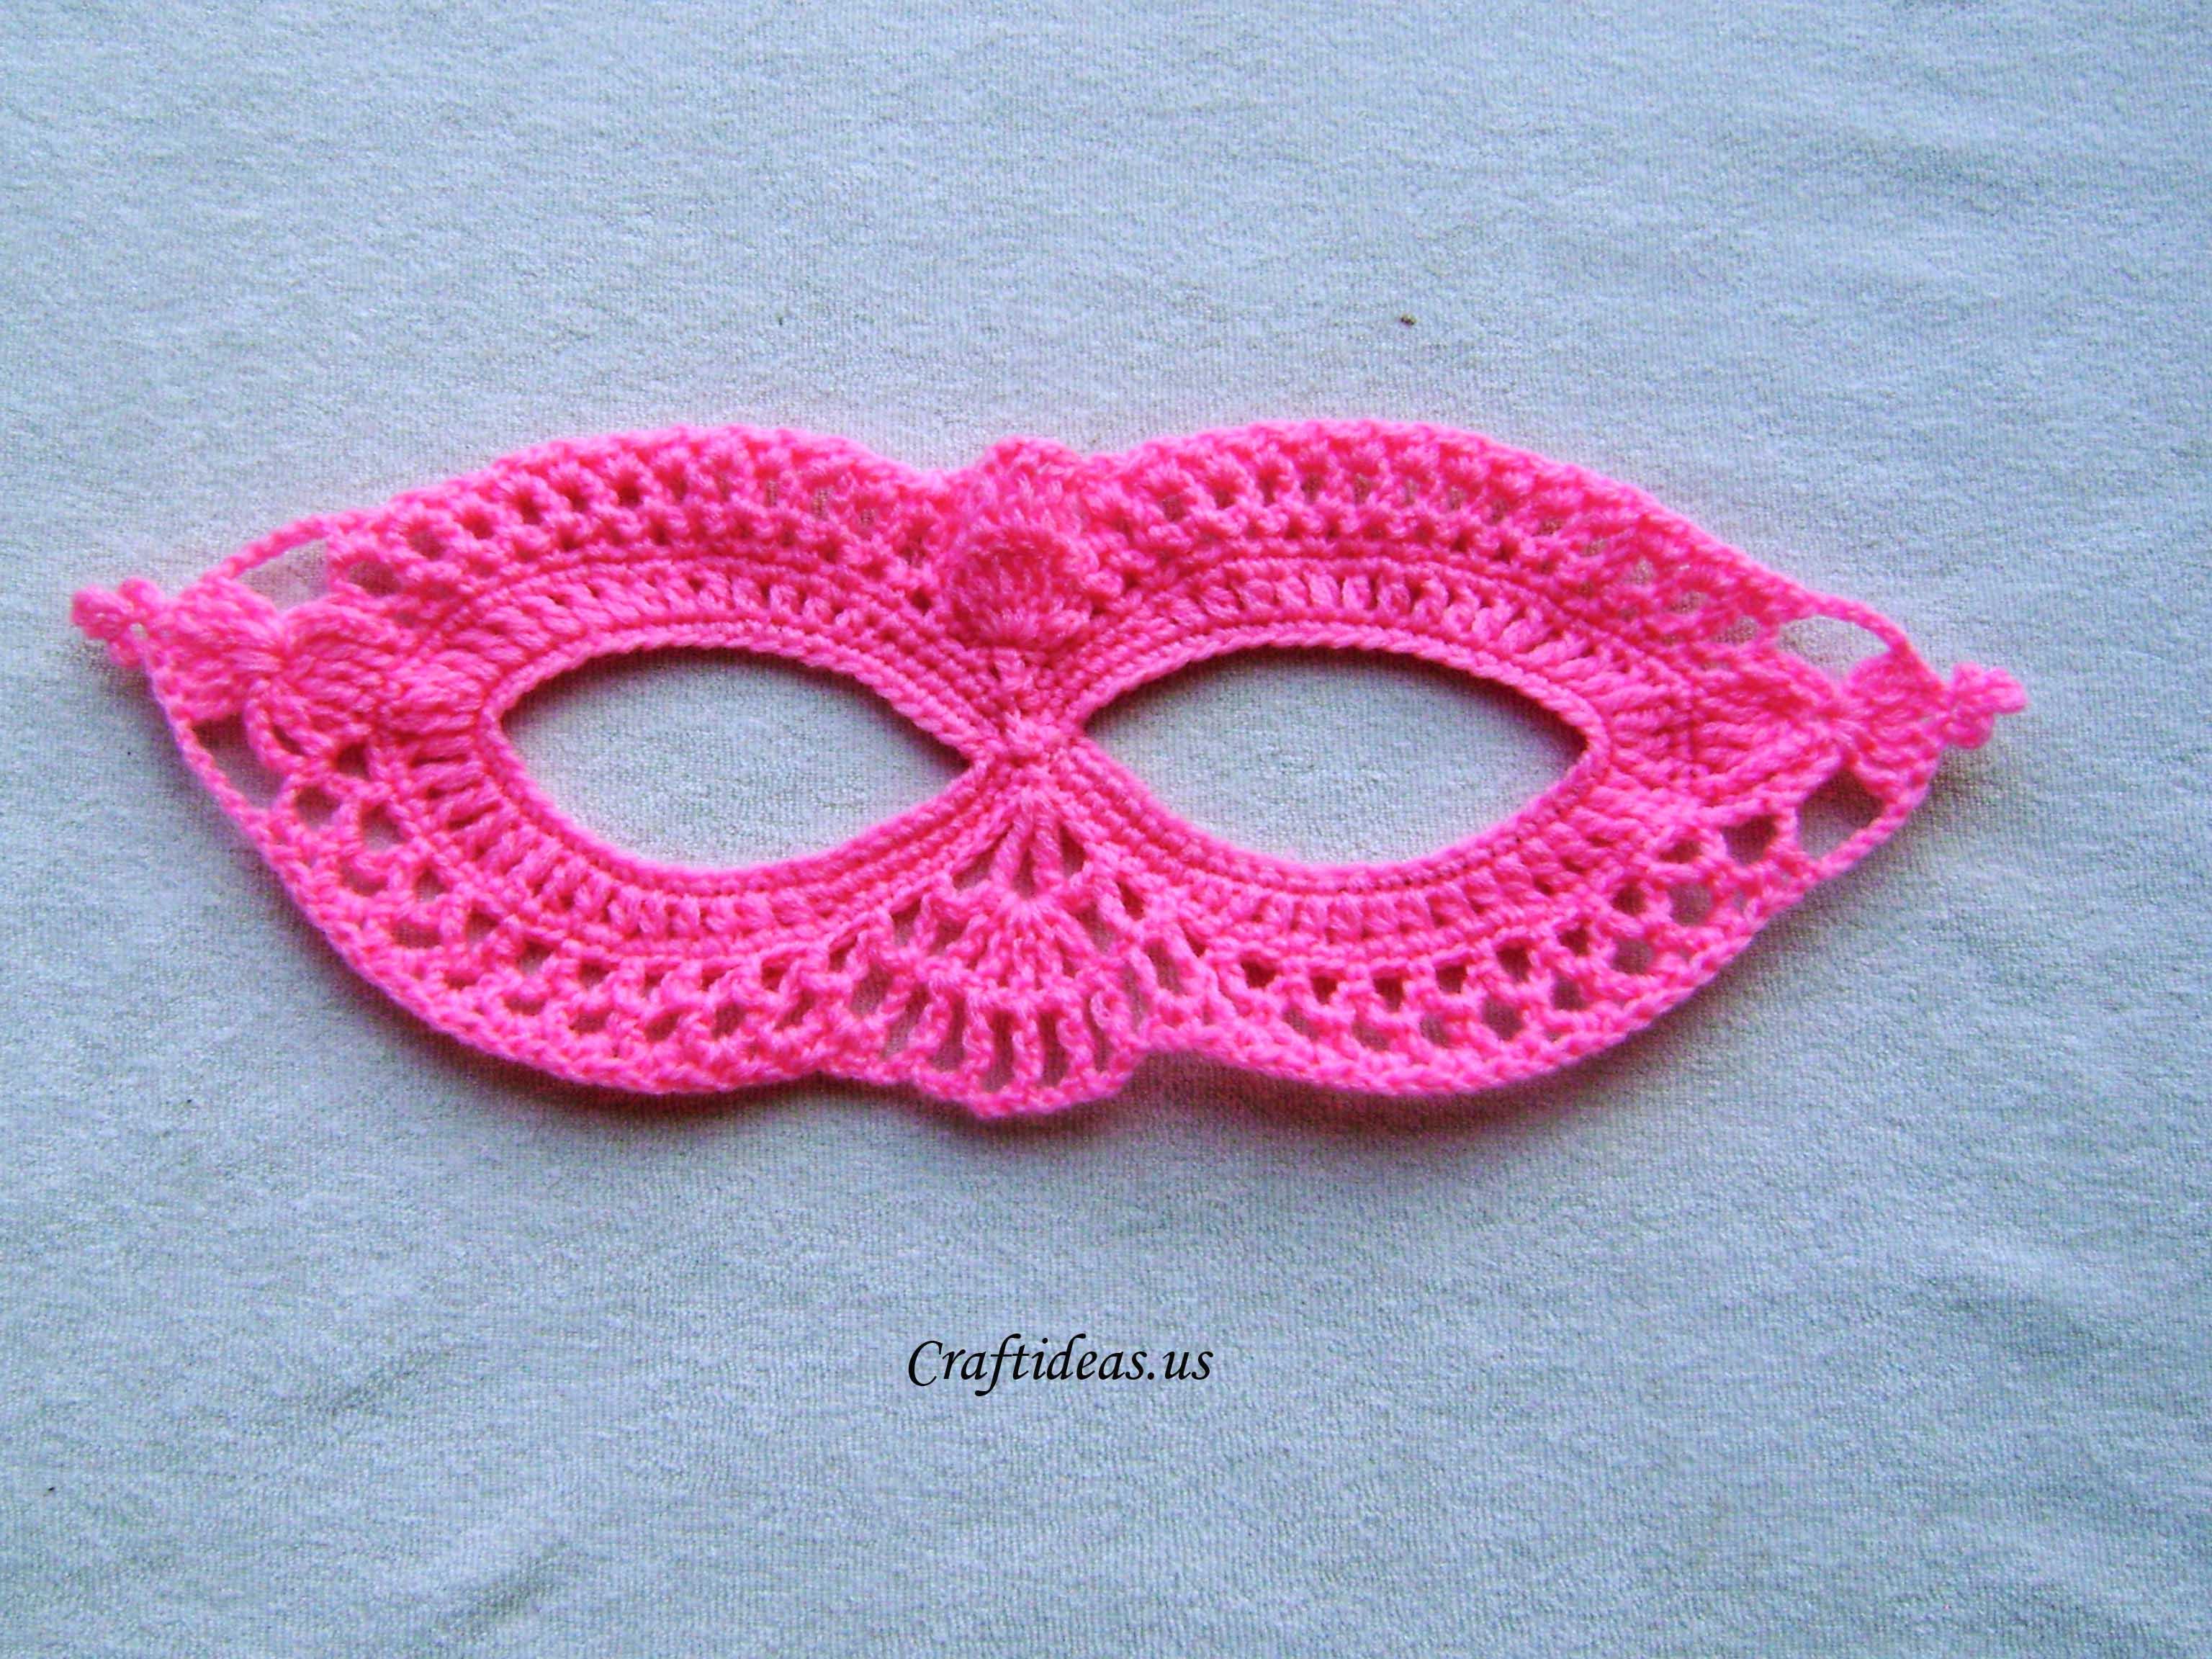 Halloween craft ideas: Crochet mask tutorial - Craft Ideas